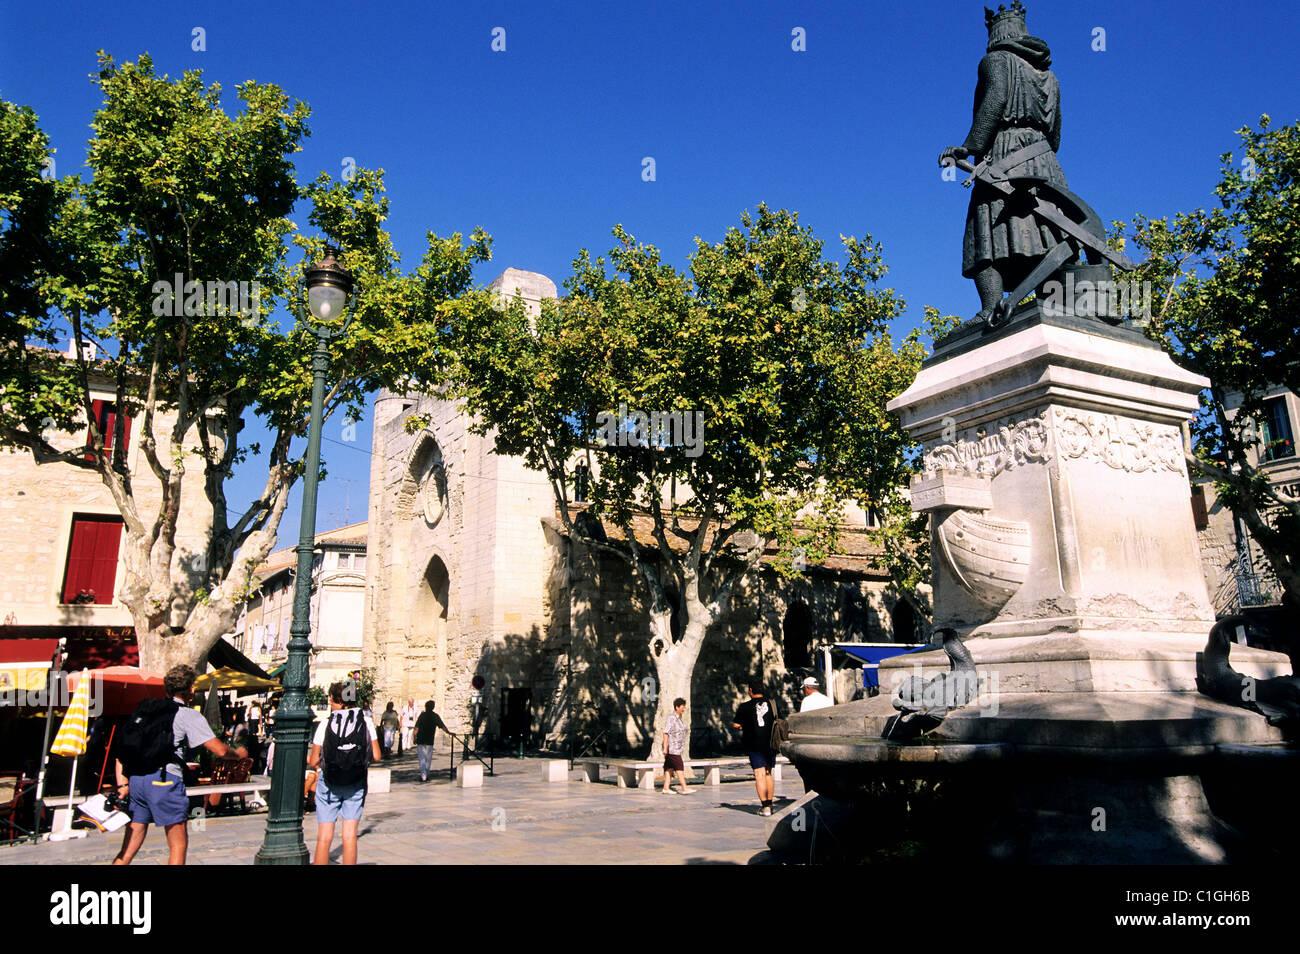 France, Gard, town of Aigues-Mortes, Saint Louis square - Stock Image